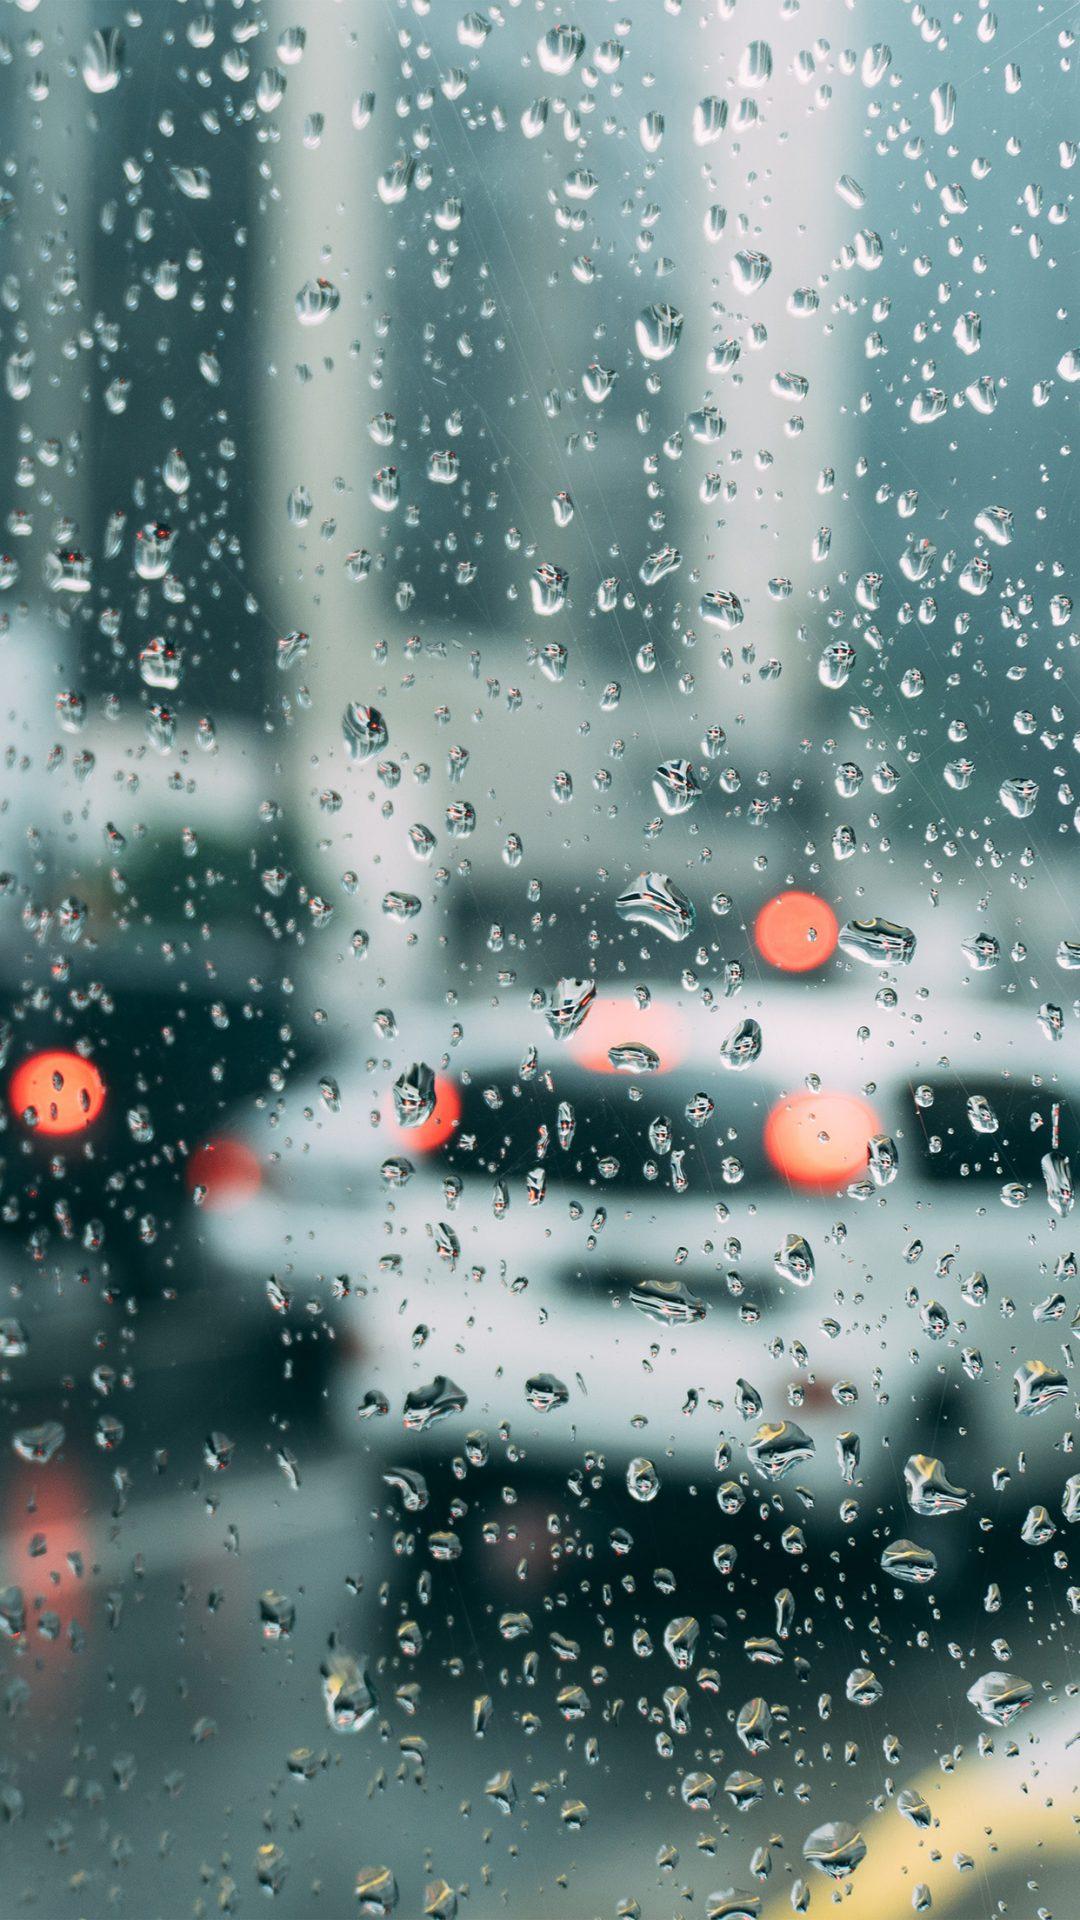 Rain Window Bokeh Art Car Sad